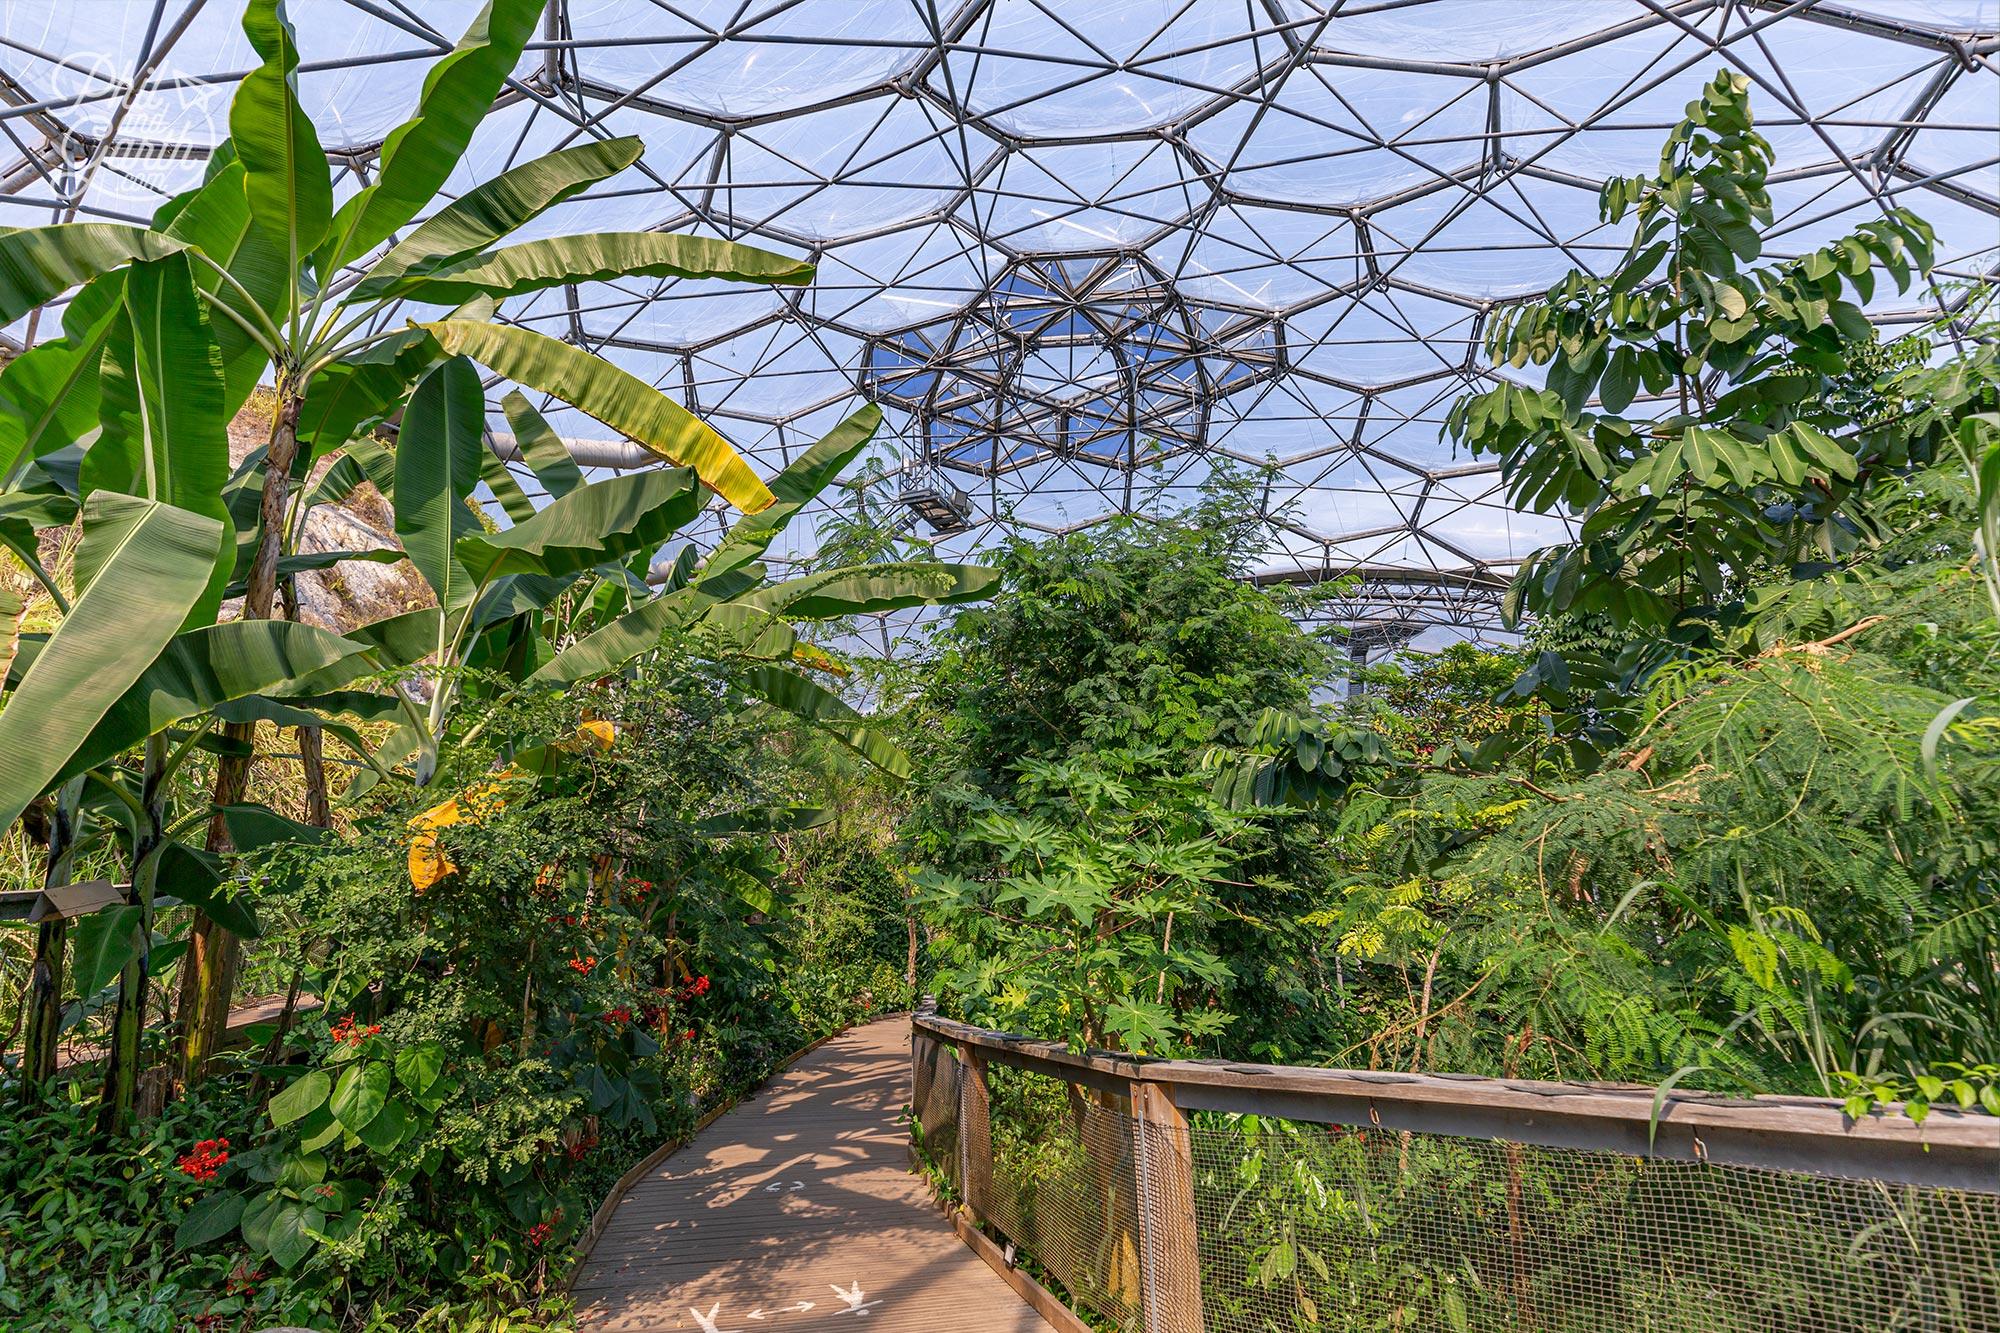 Looking across at te Rainforest Canopy Walkway